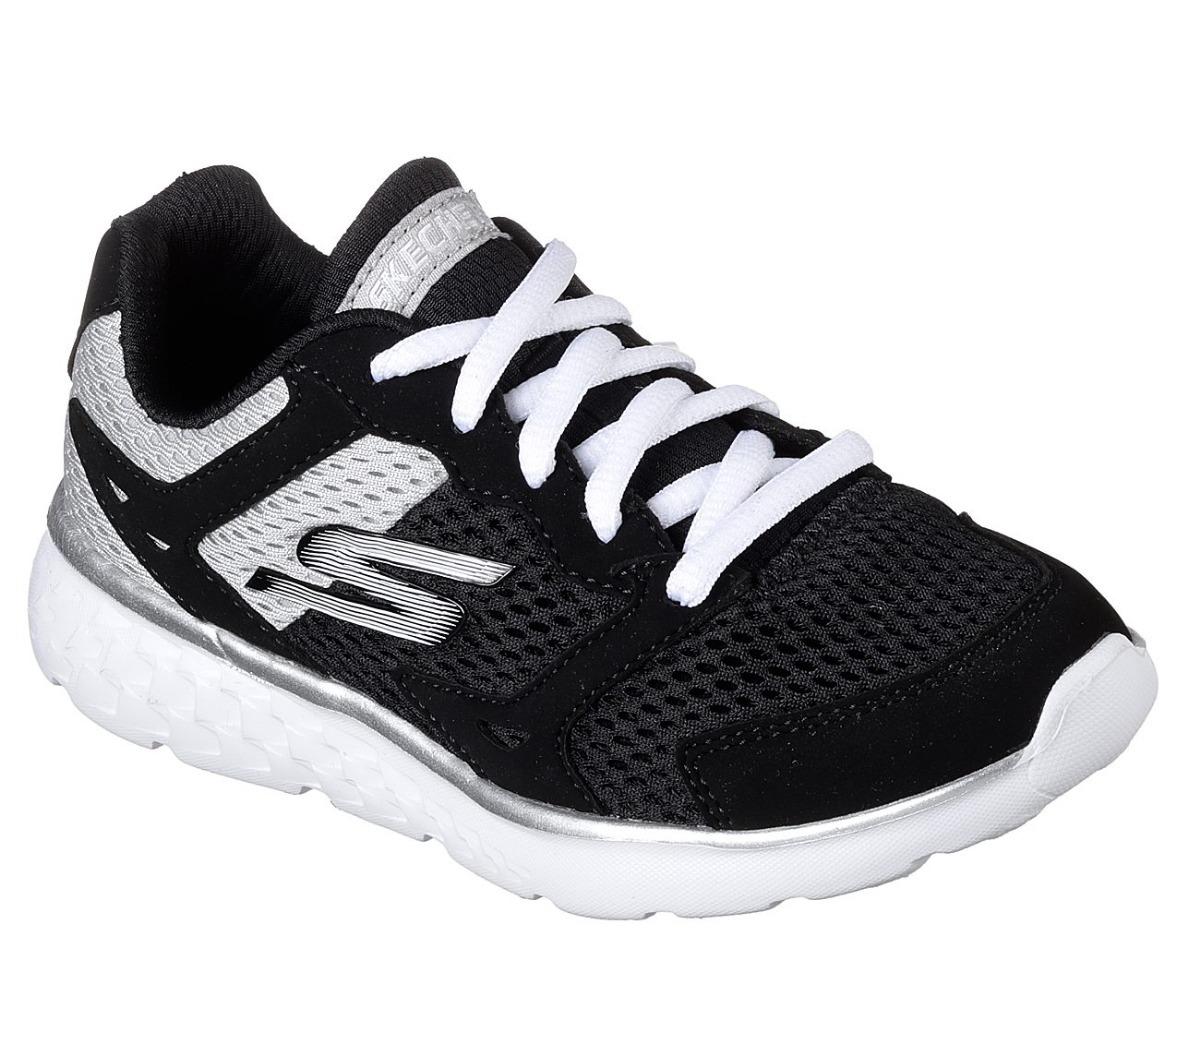 fd48ed6e zapatillas skechers niño go run 400 zodox deportivas running. Cargando zoom.